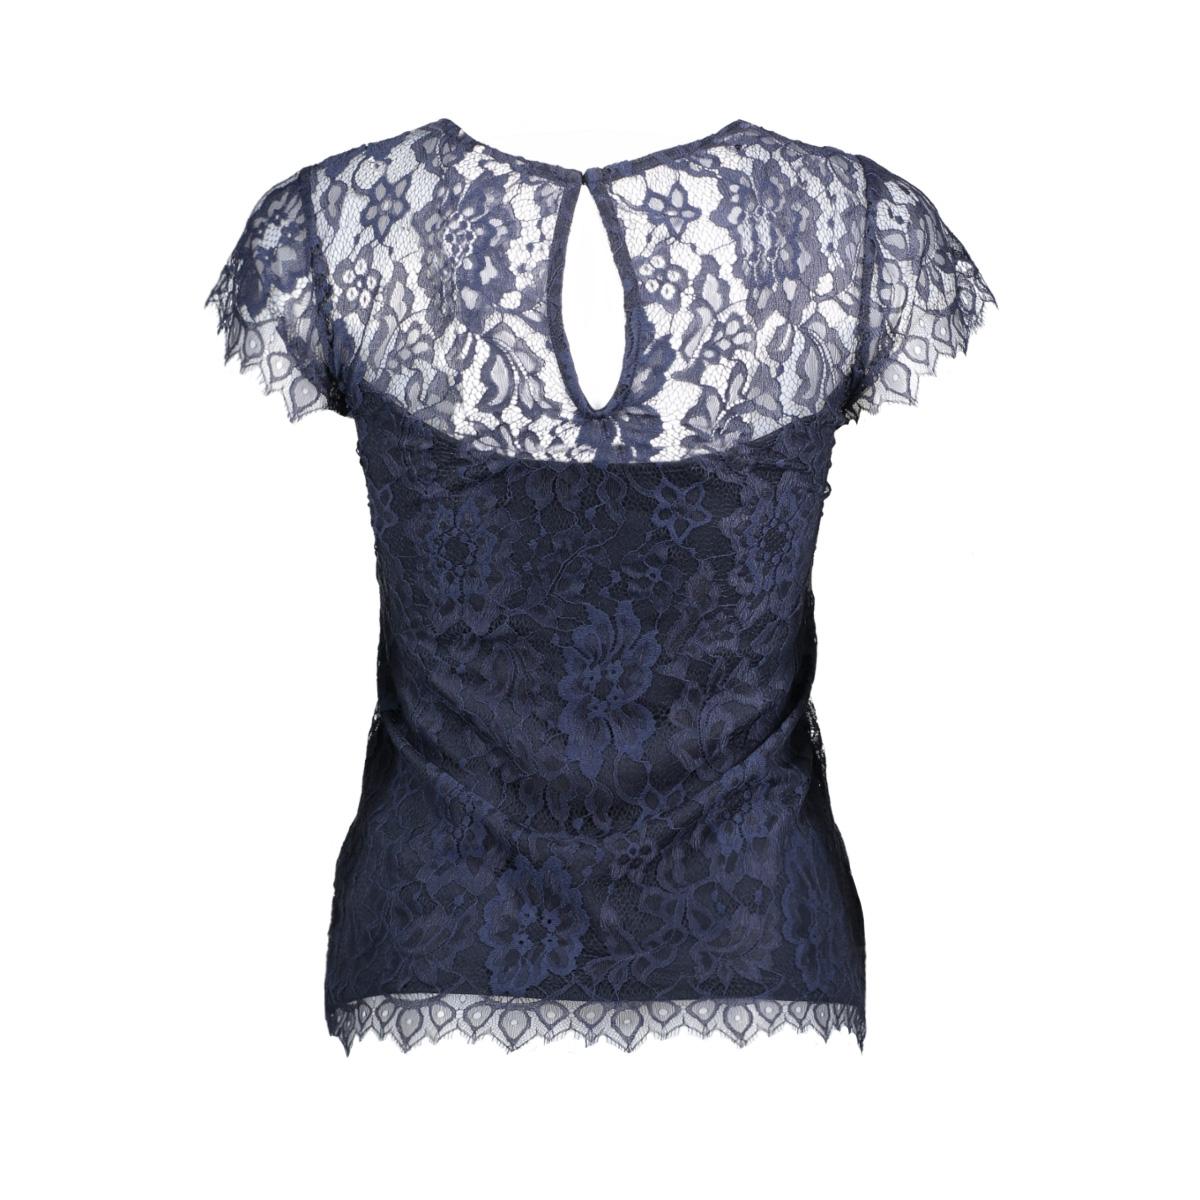 vifemira top/1 14046235 vila t-shirt total eclipse